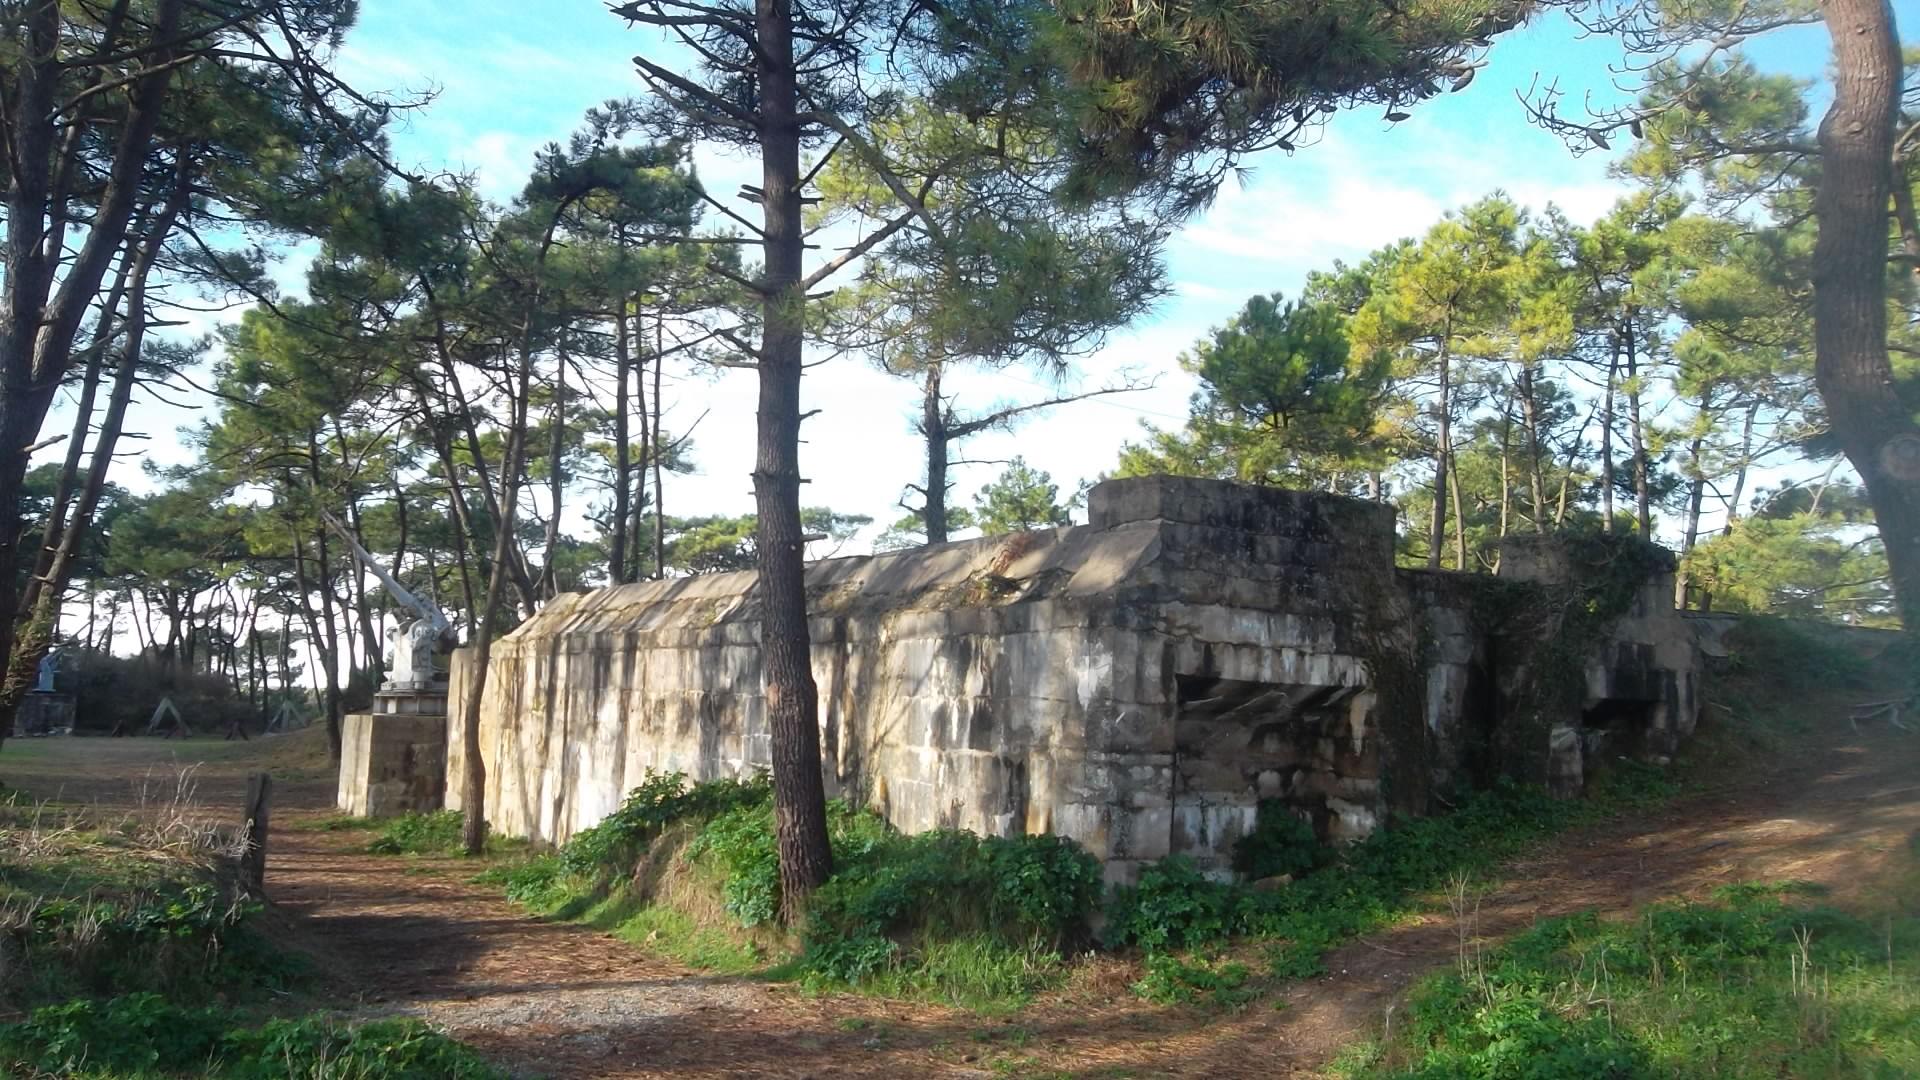 Plouharnel bunkers of WWII atlantic wall mus jan14